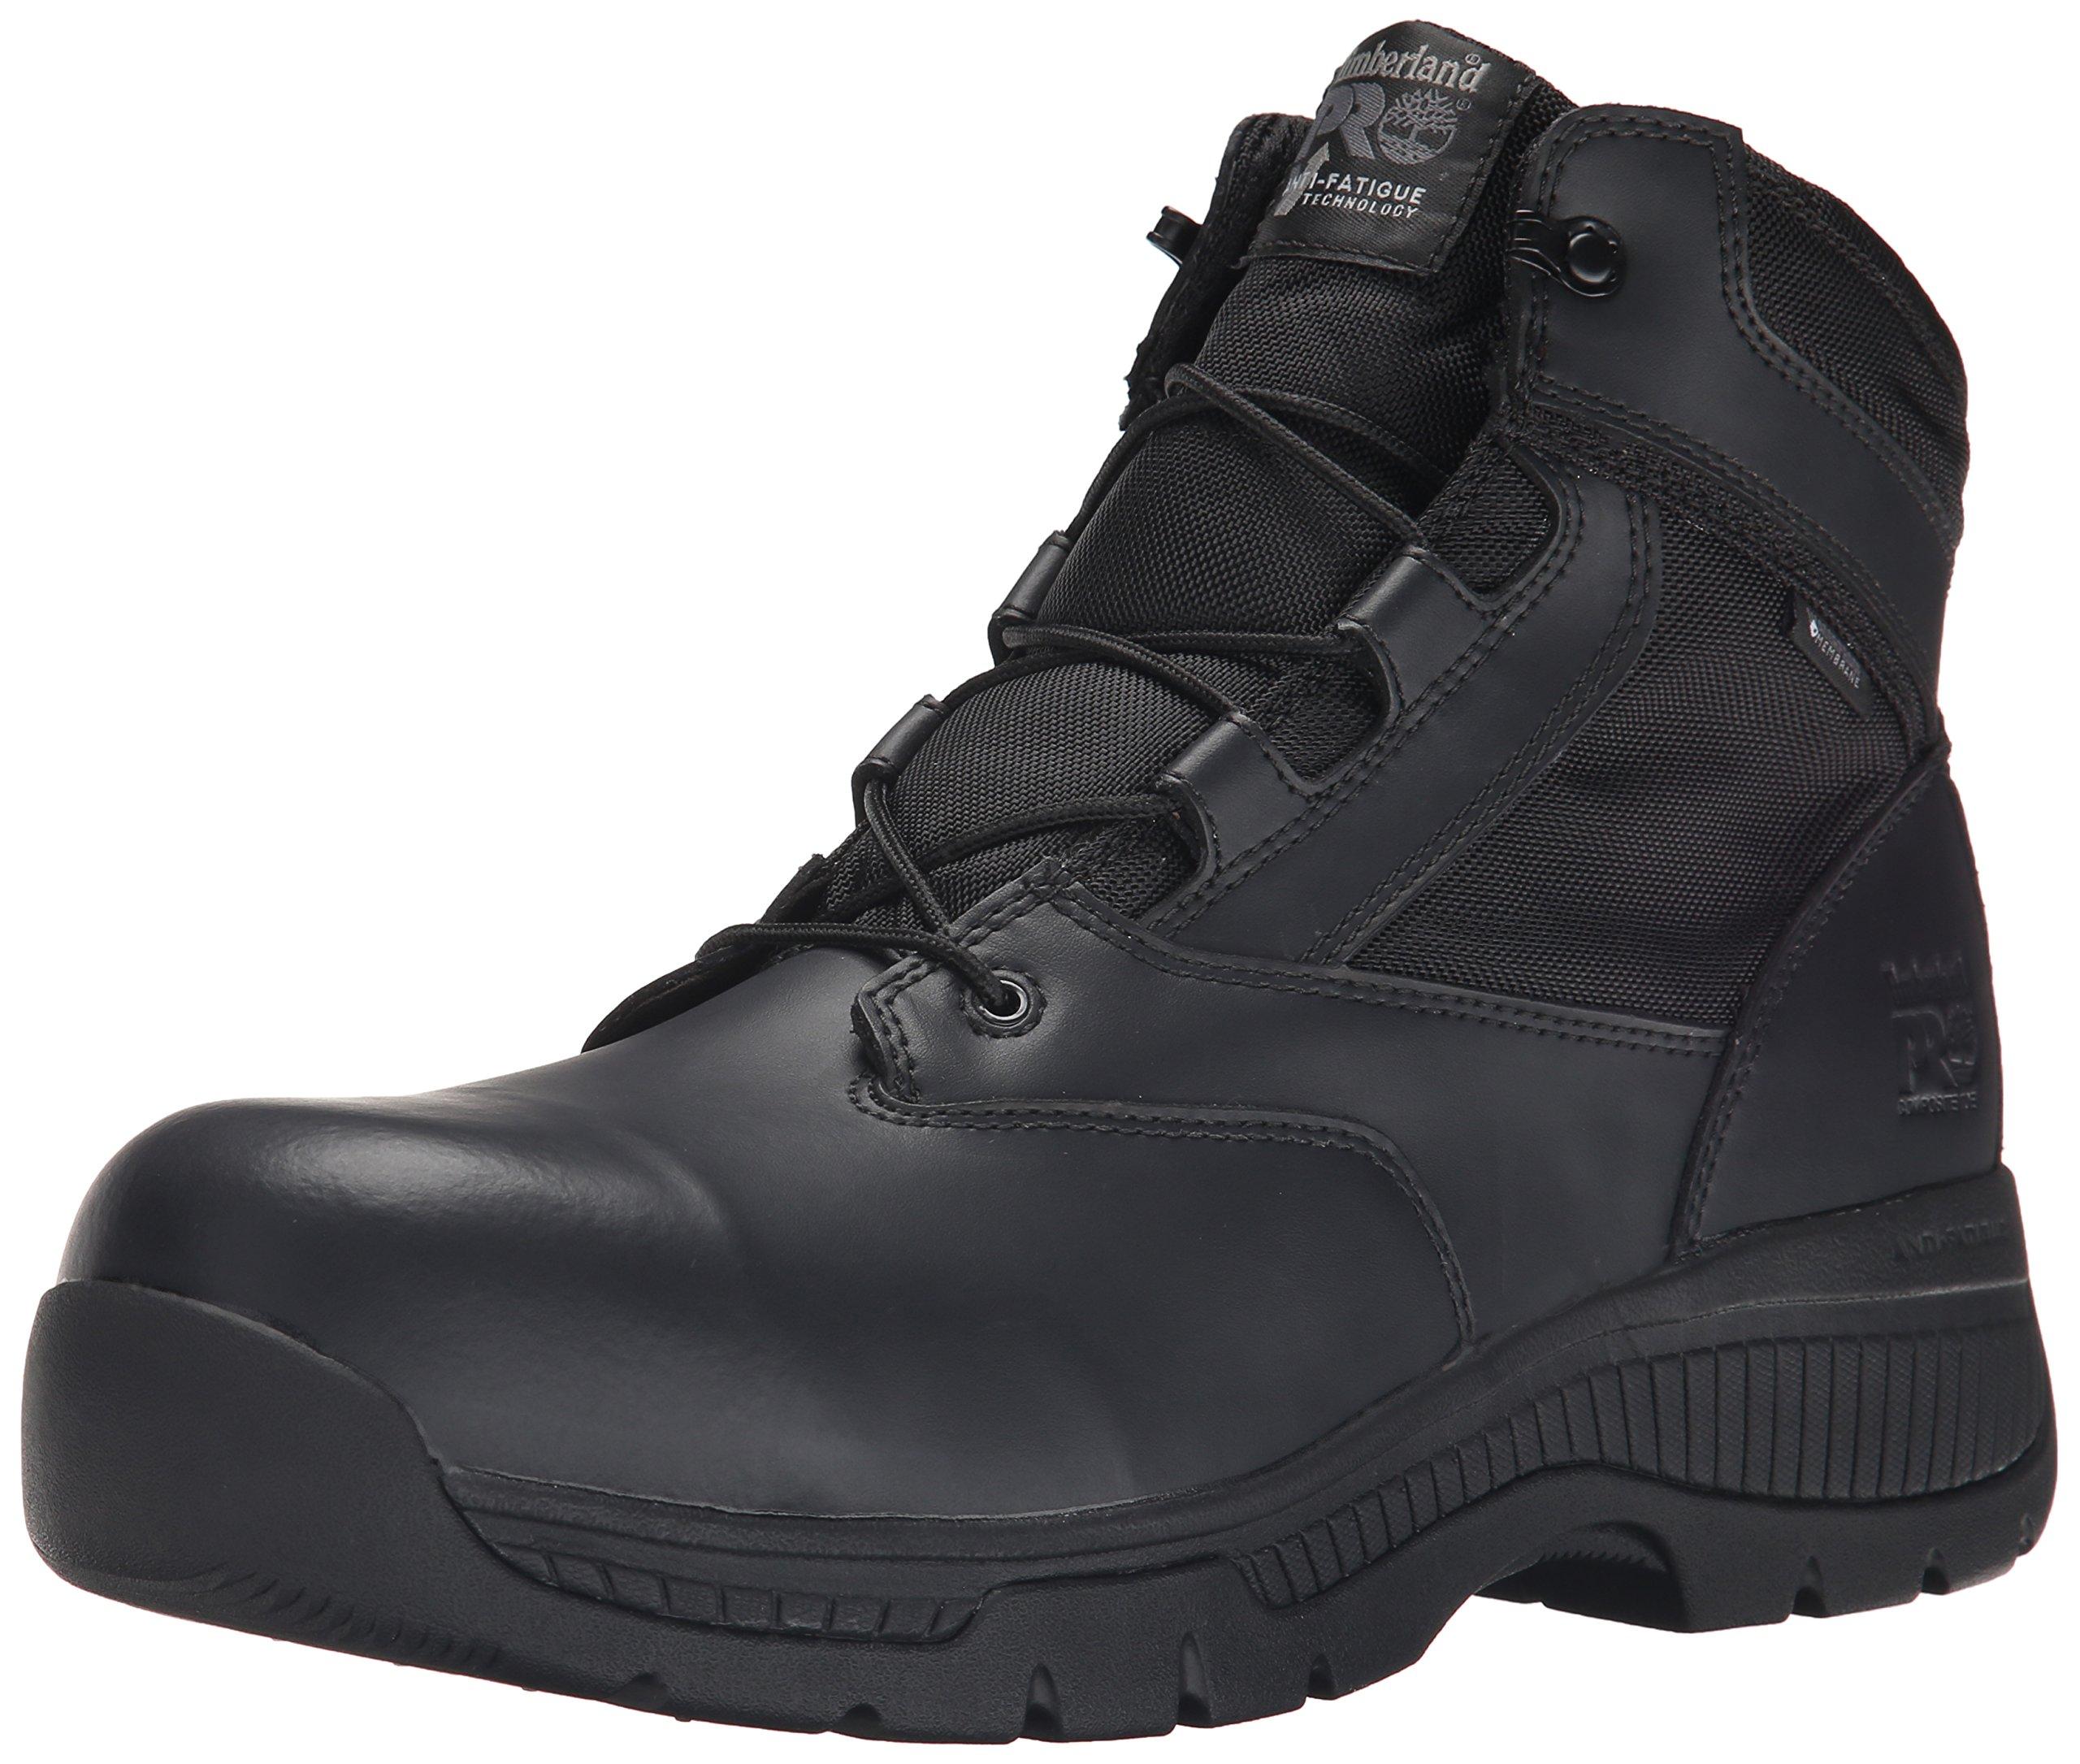 Timberland PRO Men's 6 Inch Valor Comp Toe Waterproof Side Zip Work Boot, Black Smooth Leather Ballistic Nylon, 9.5 M US